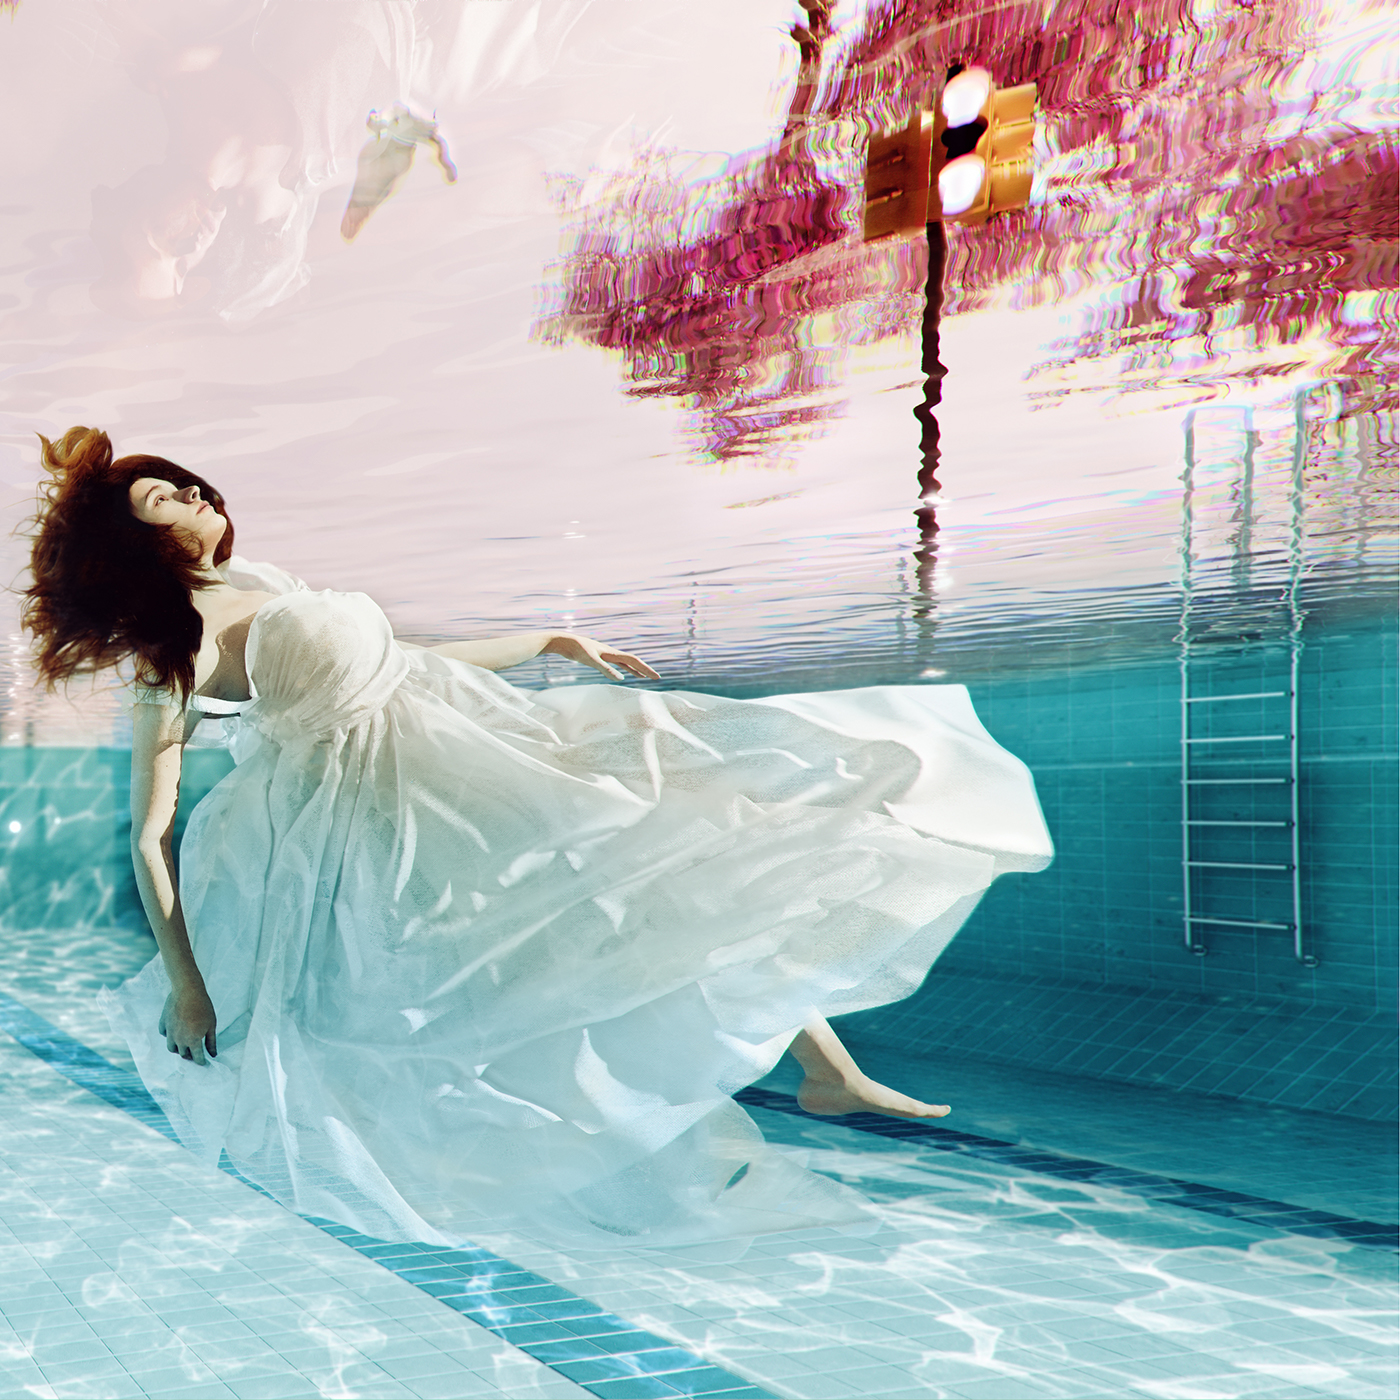 Wallflower - Teach Yourself To Swim